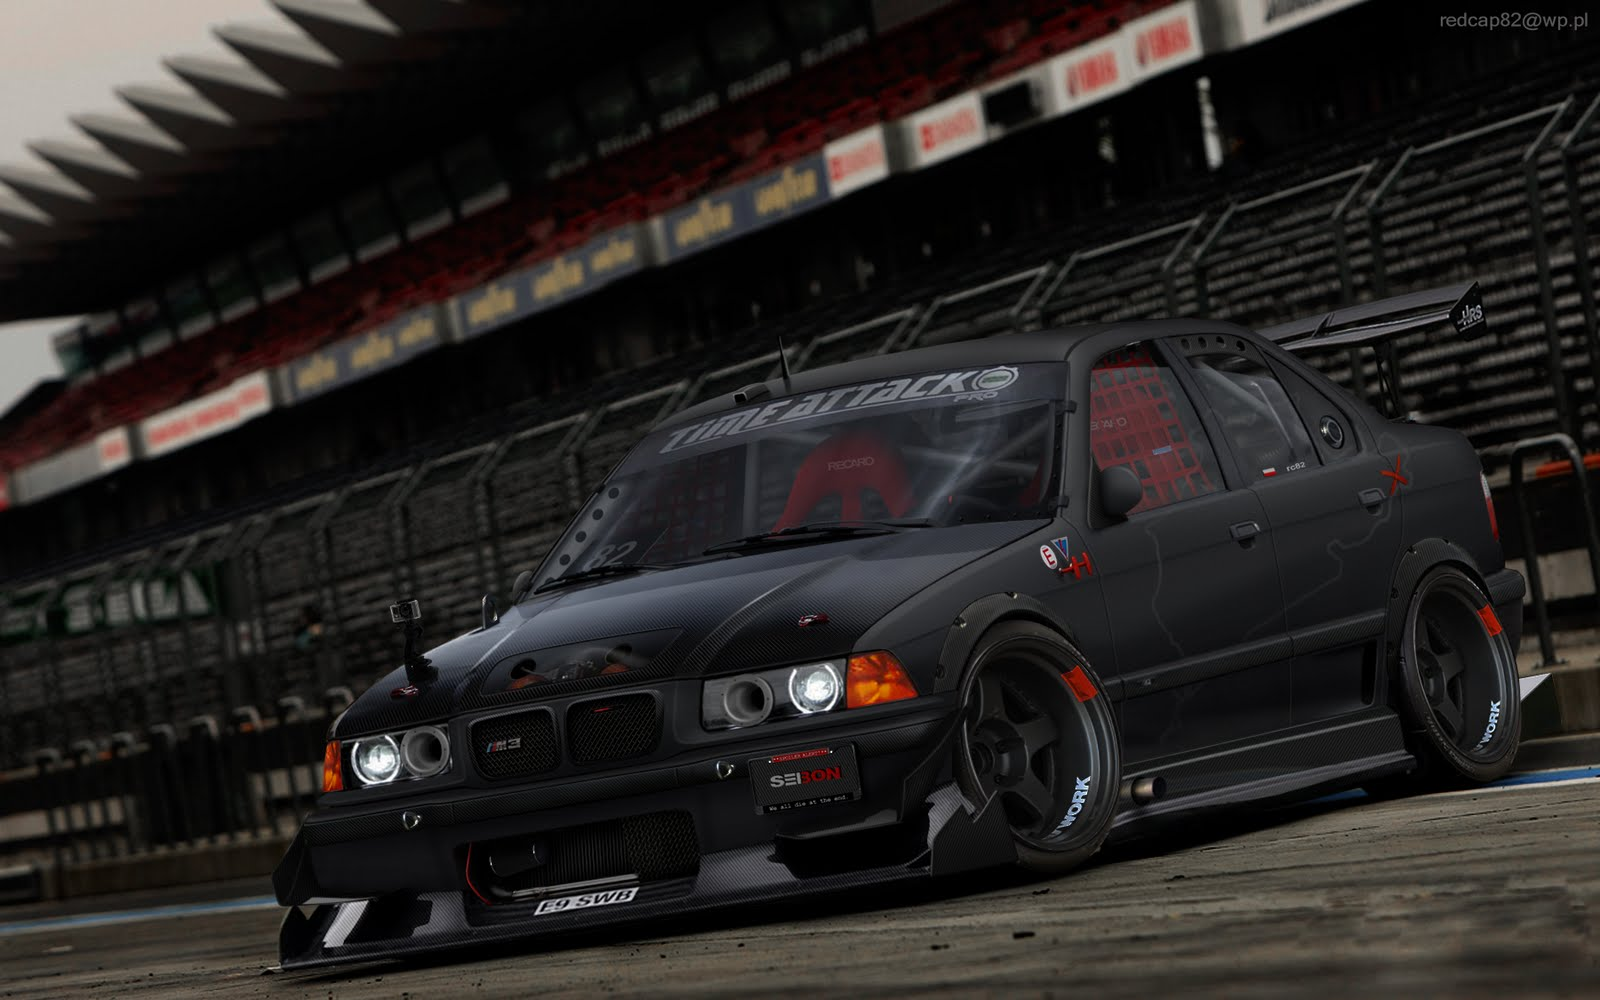 http://2.bp.blogspot.com/-Mro794cchI0/TecEj5-YYRI/AAAAAAAAAI4/9kRPVqhLPRc/s1600/Time_Attack_BMW_M3_E36_EVO_by_rc82-workchop.jpg